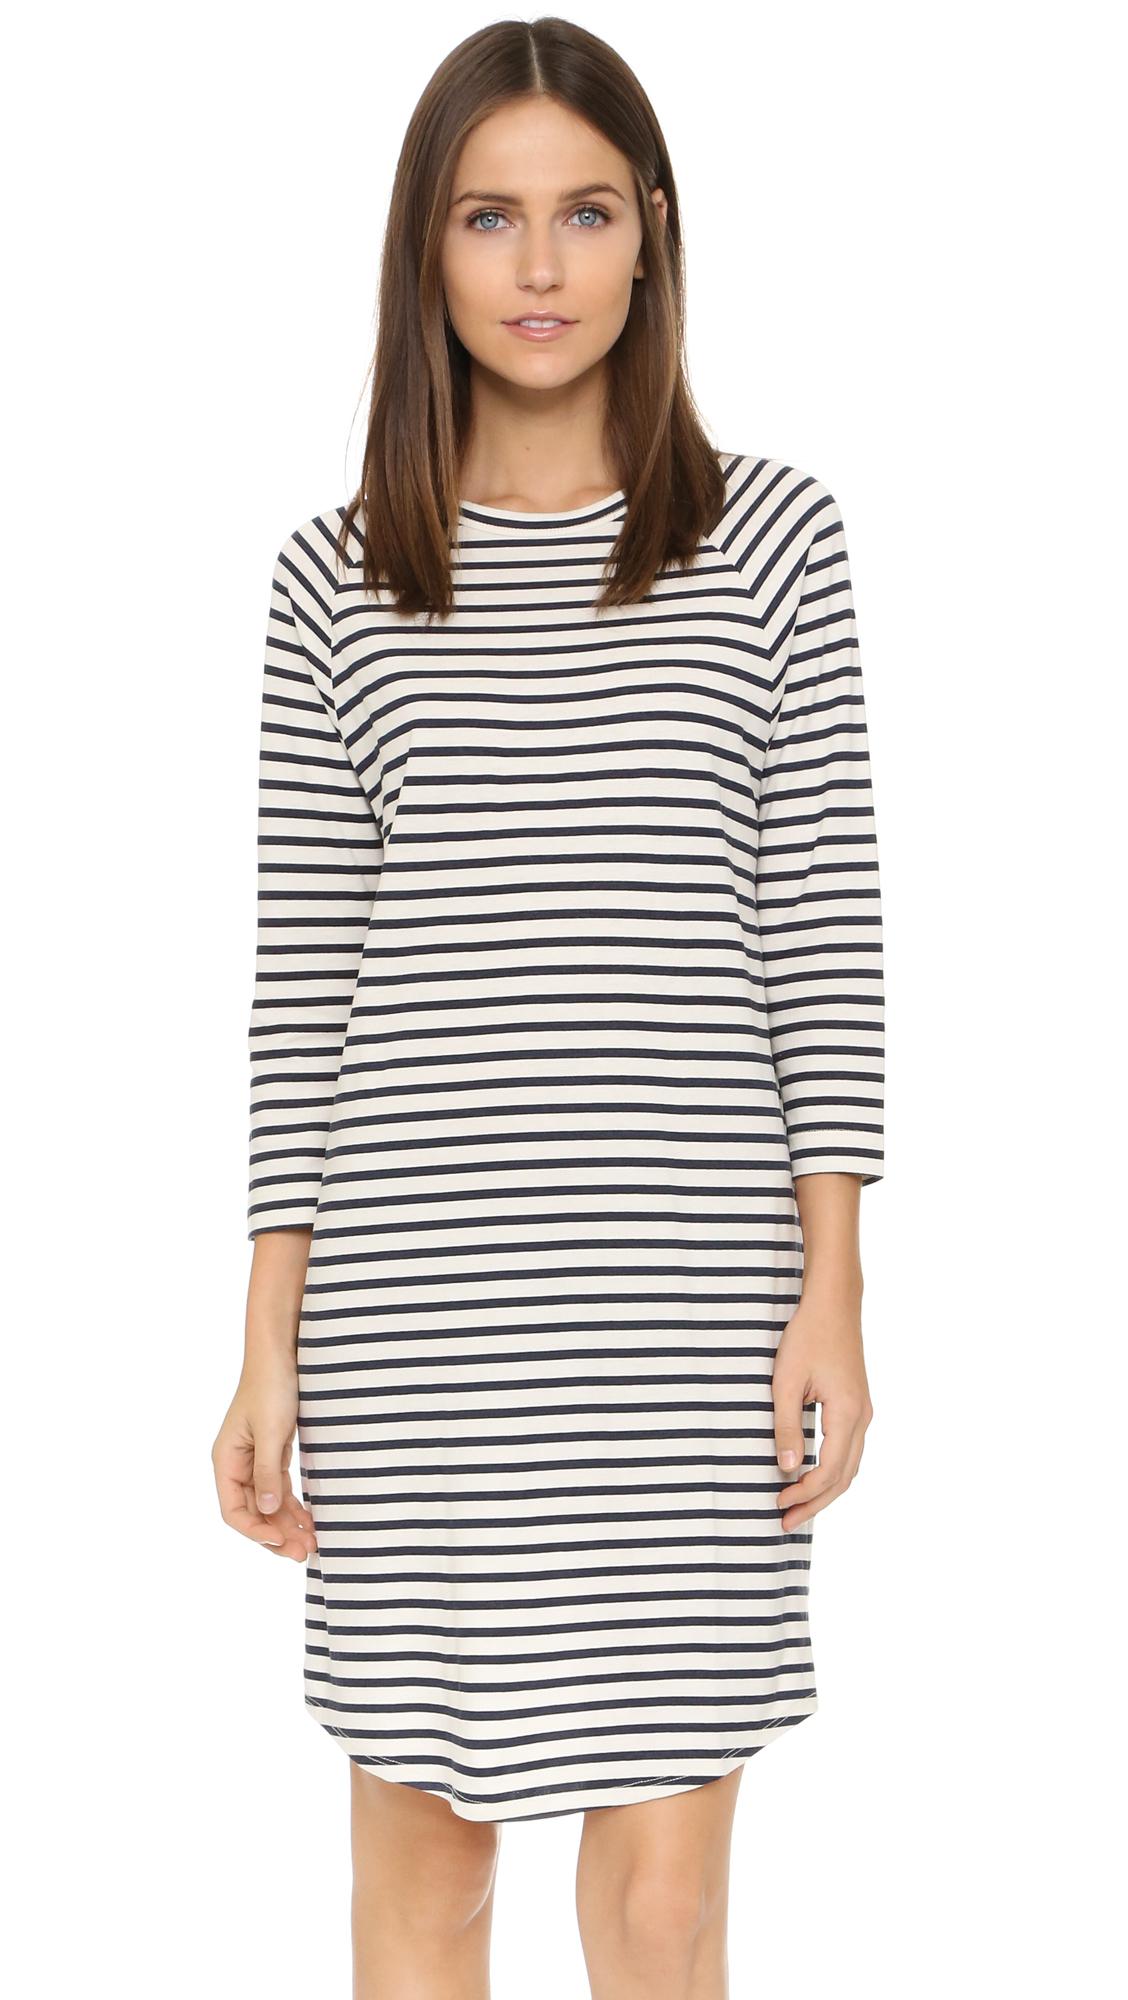 4586fb5db8b4 Lyst - 6397 Stripe Long Sleeve Dress in Blue